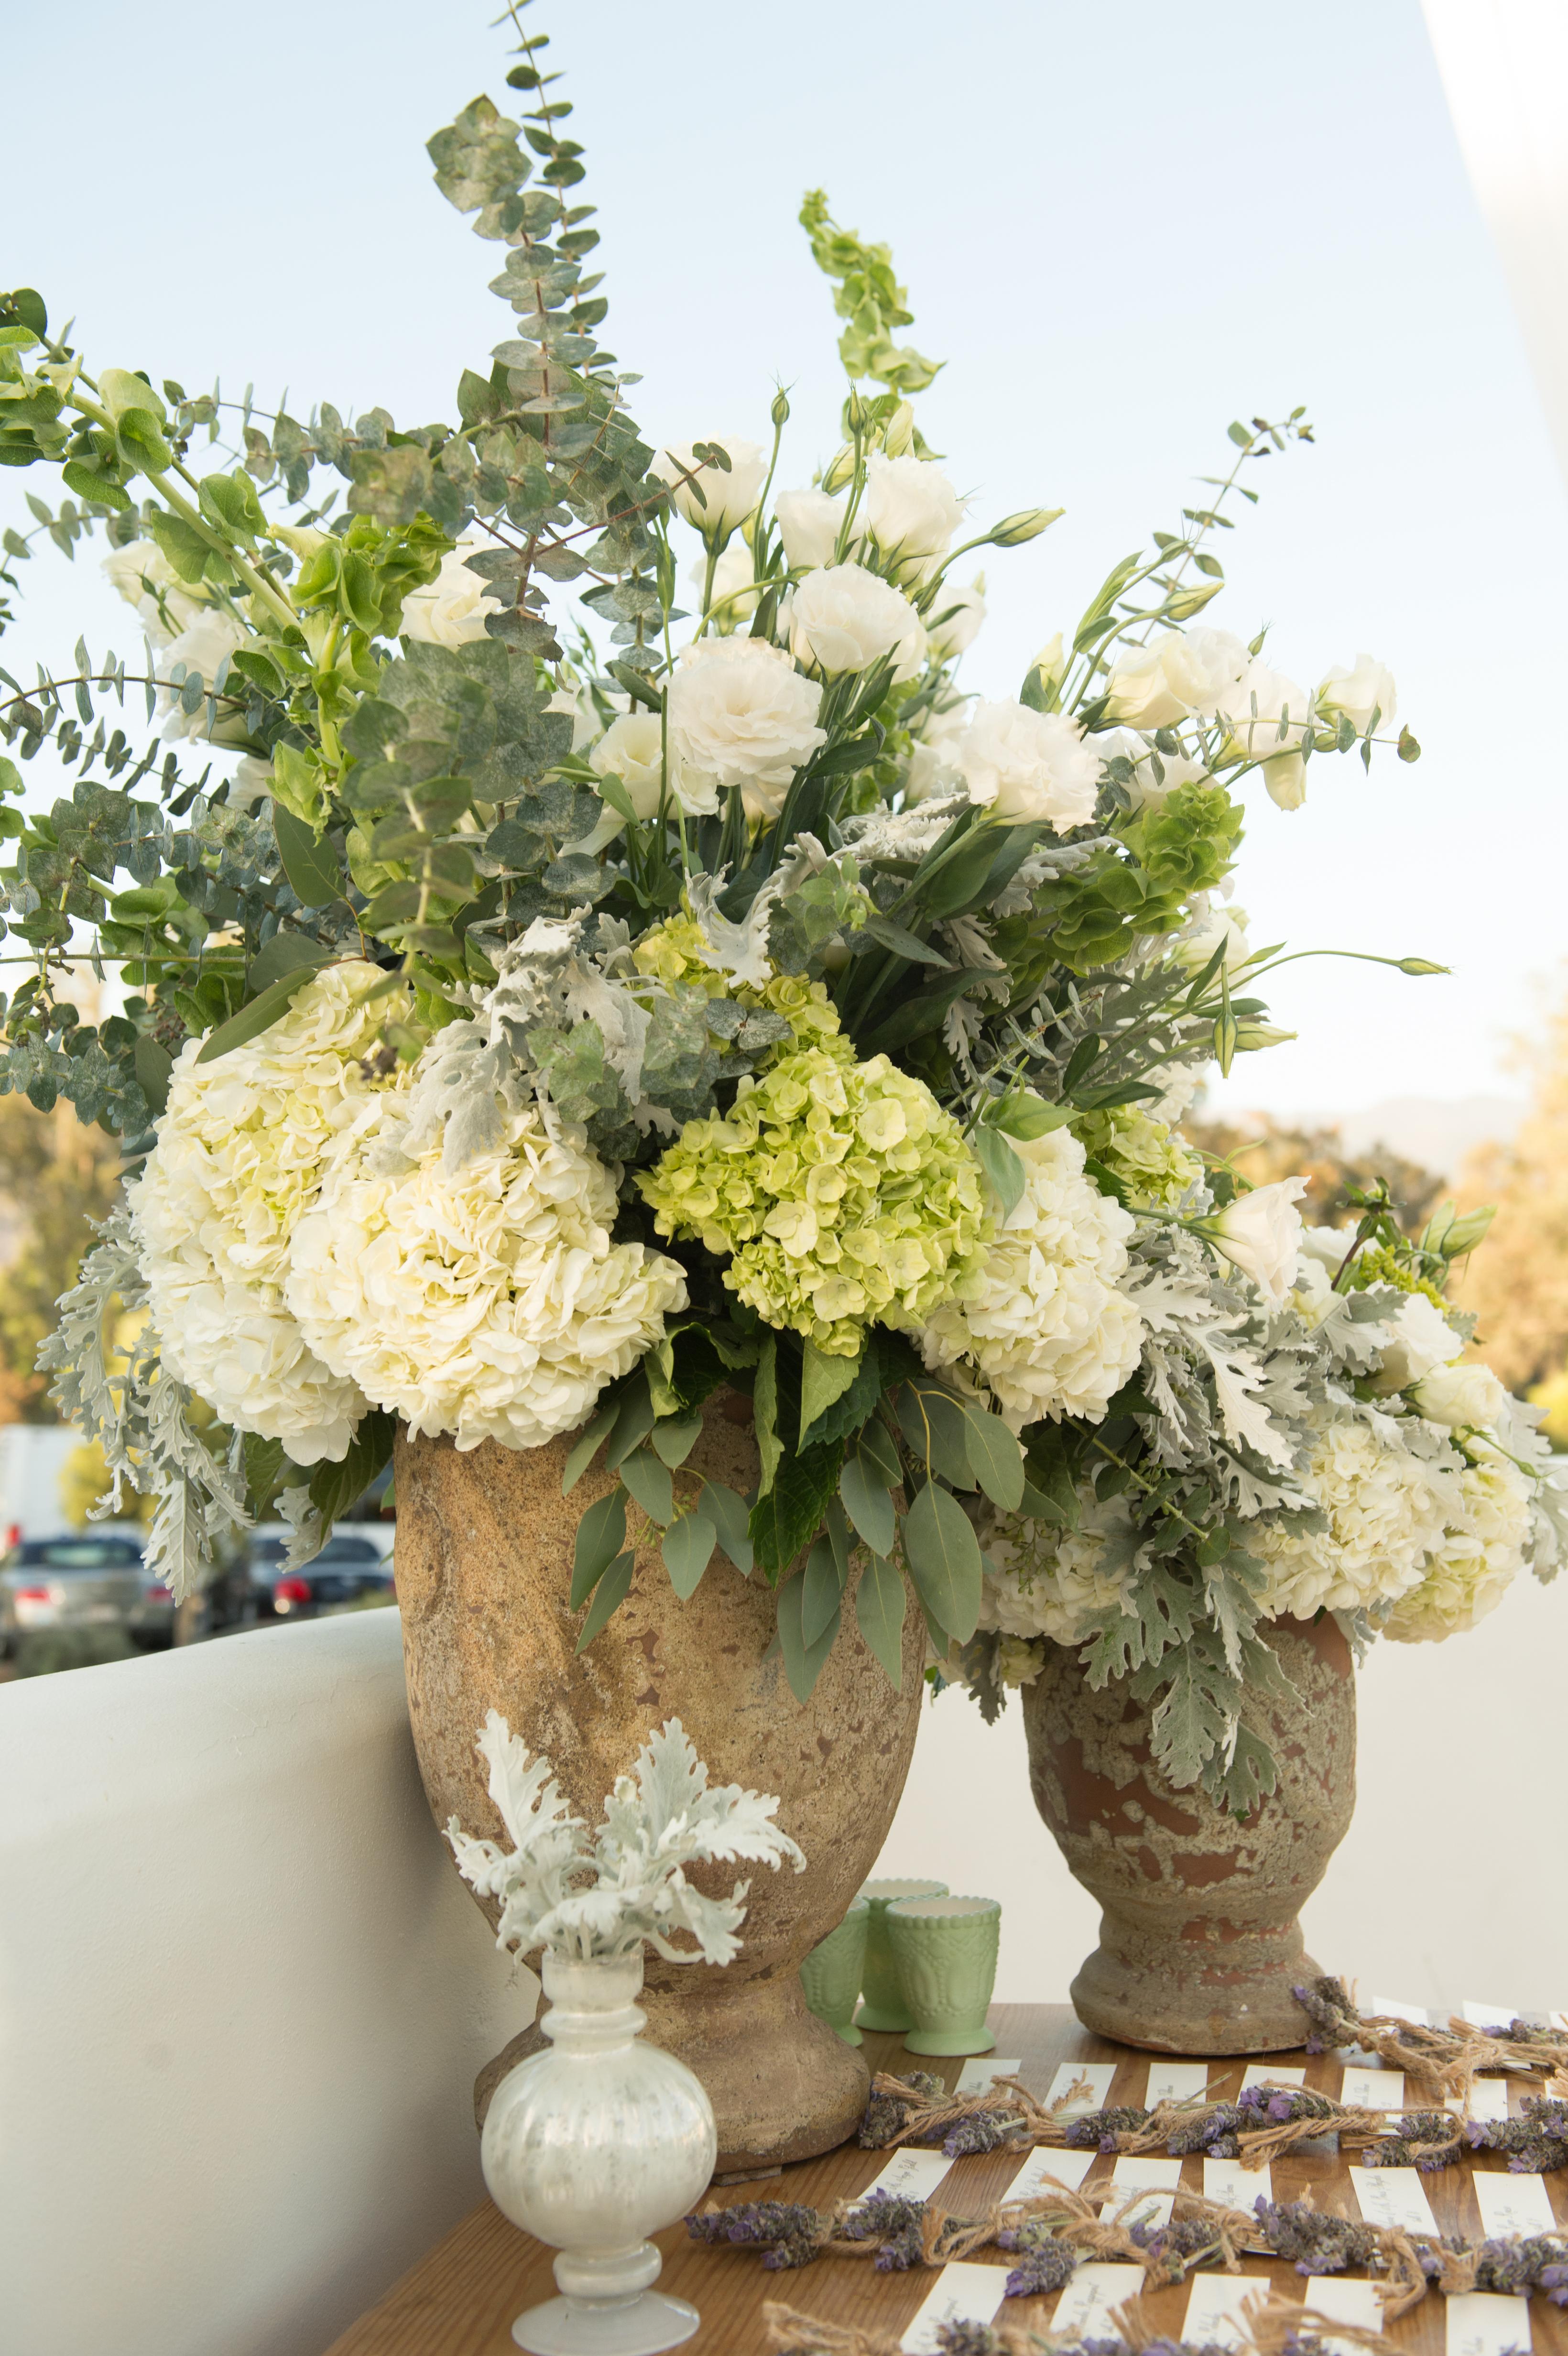 How to save money on your wedding flowers huffpost life how to save money on your wedding flowers izmirmasajfo